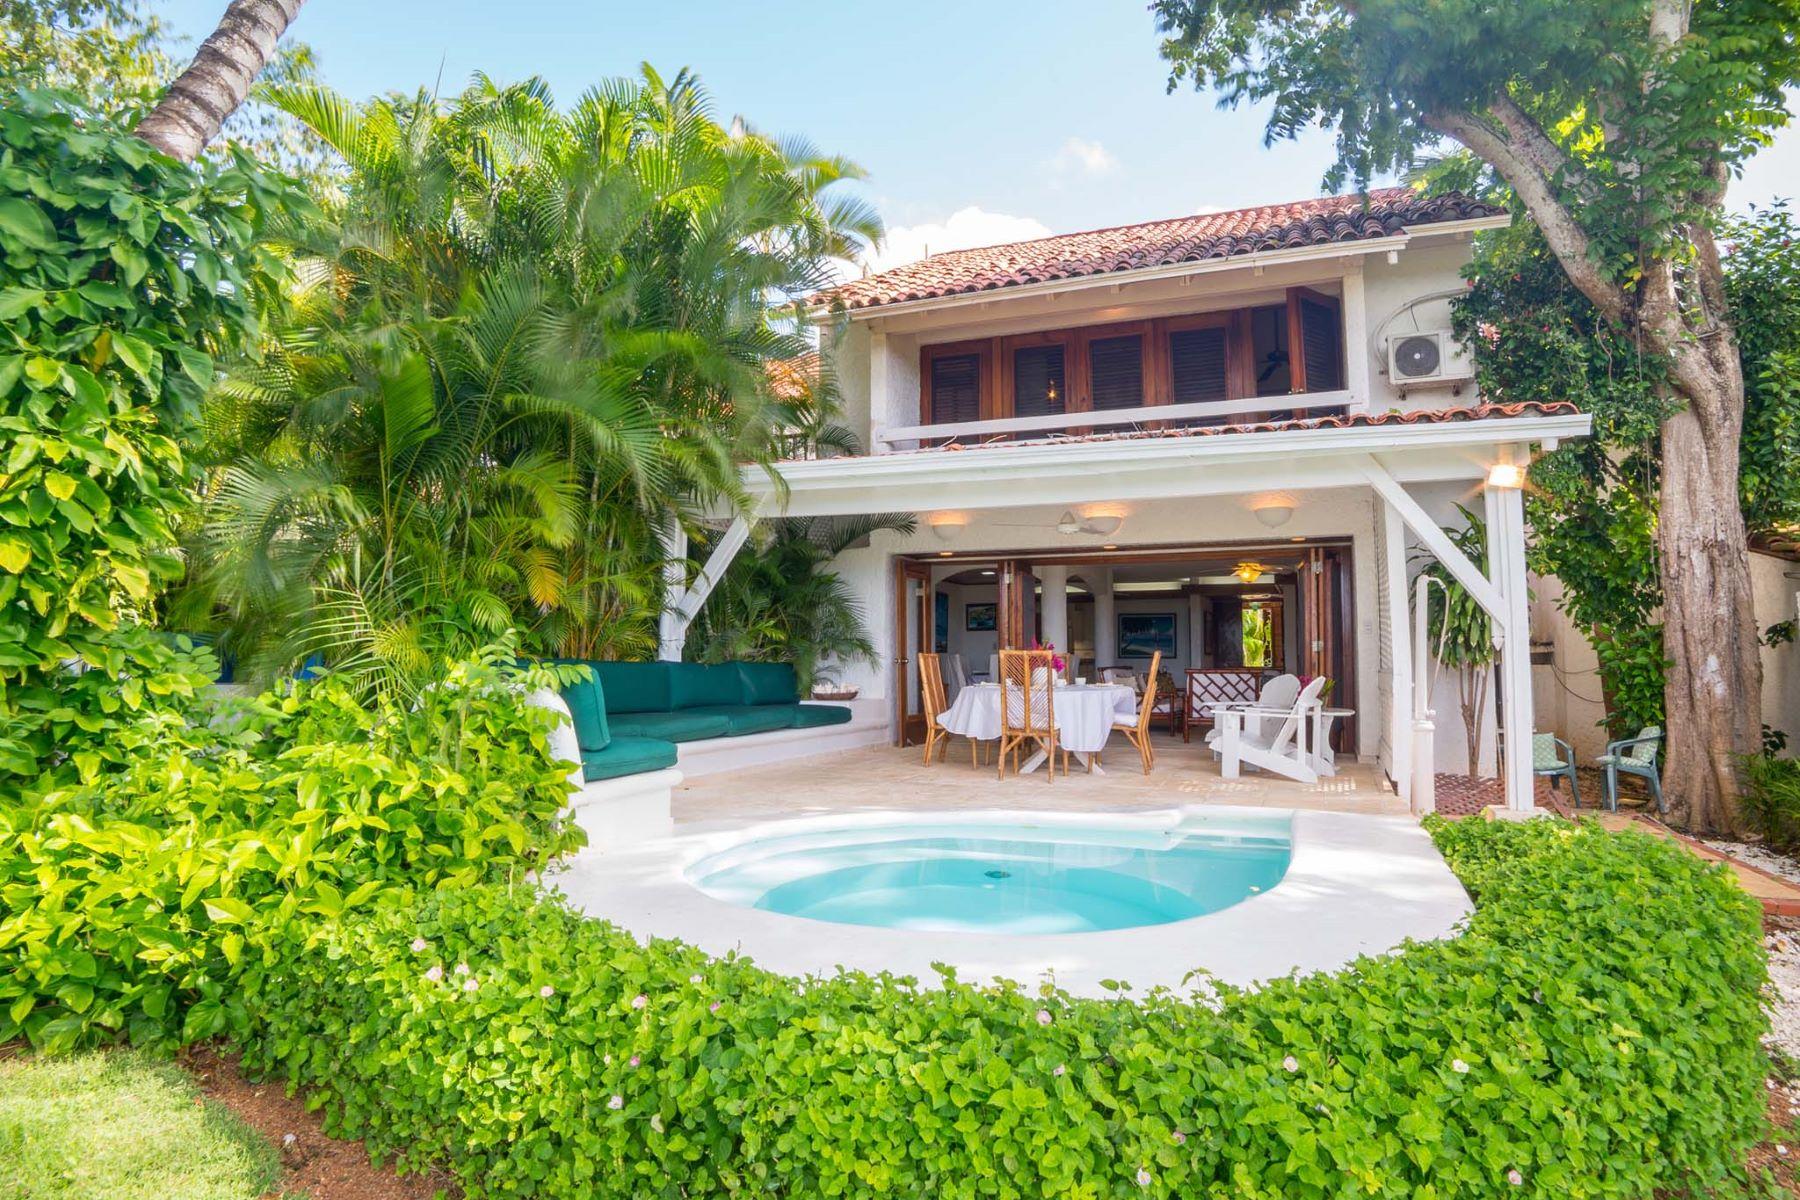 Single Family Home for Sale at Elegant and Timeless 3-bedroom Italian-Inspired Residence Casa De Campo, La Romana Dominican Republic